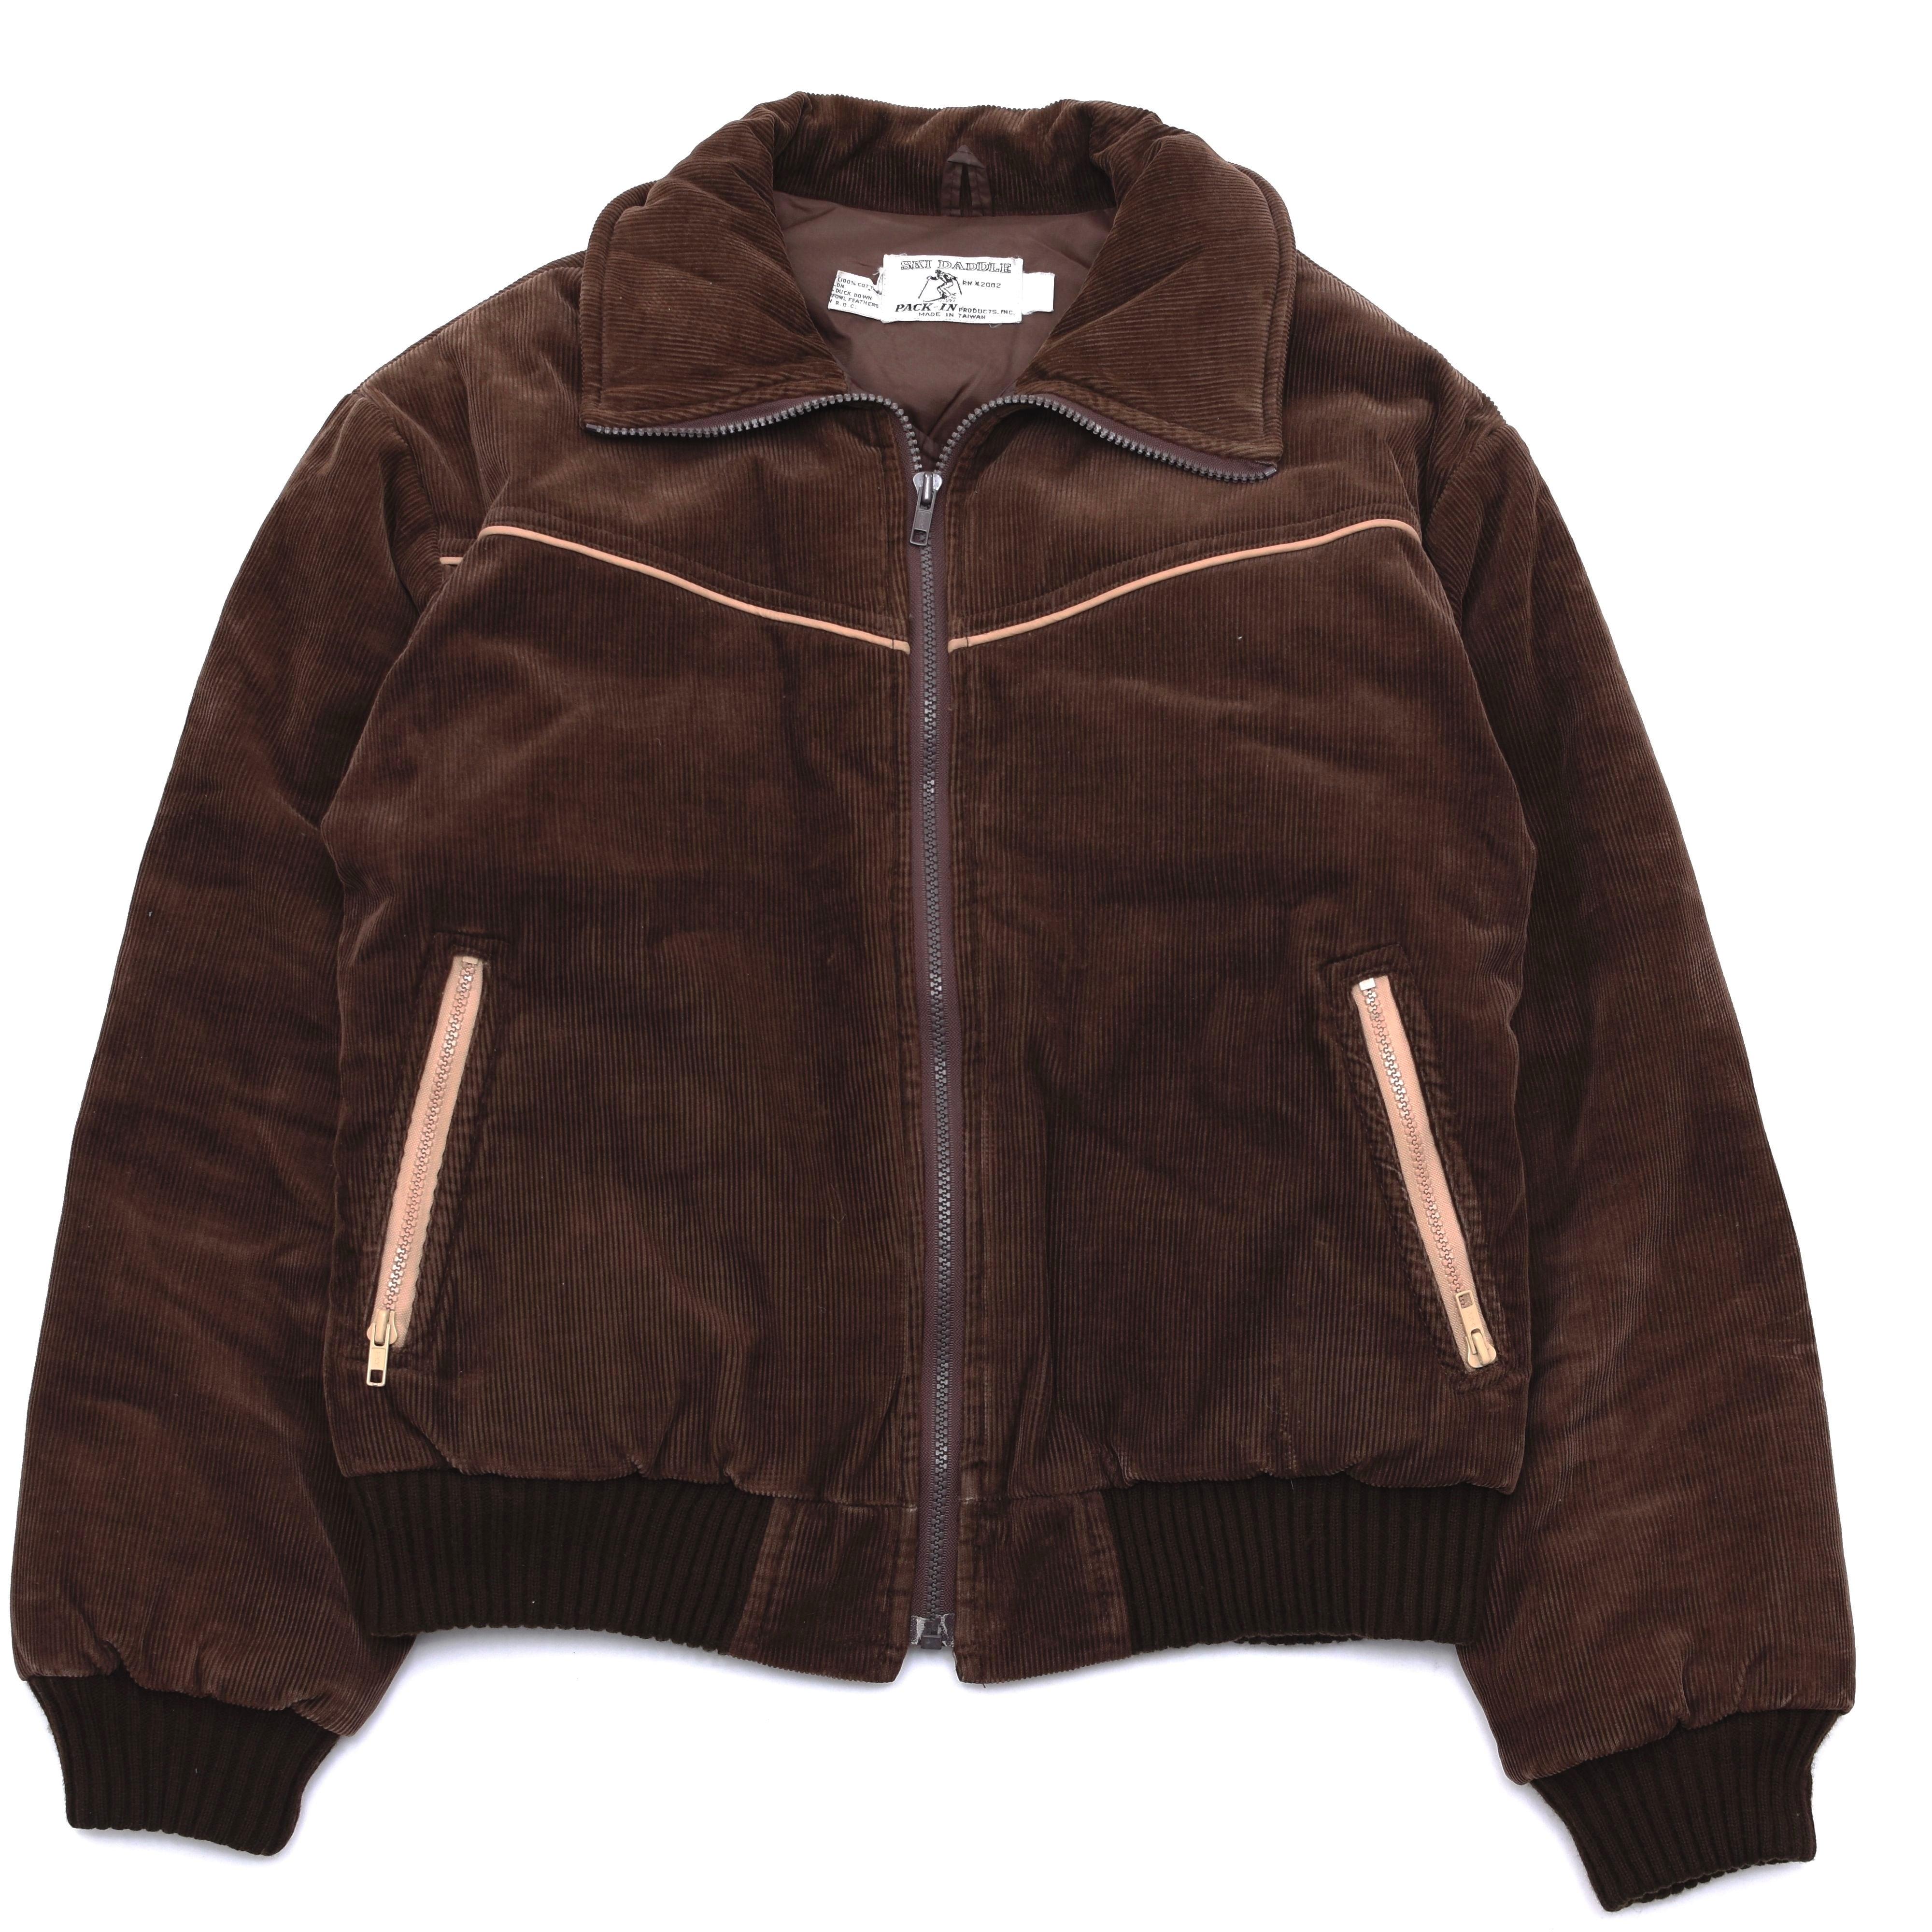 80's SKI DADDLE corduroy down jacket